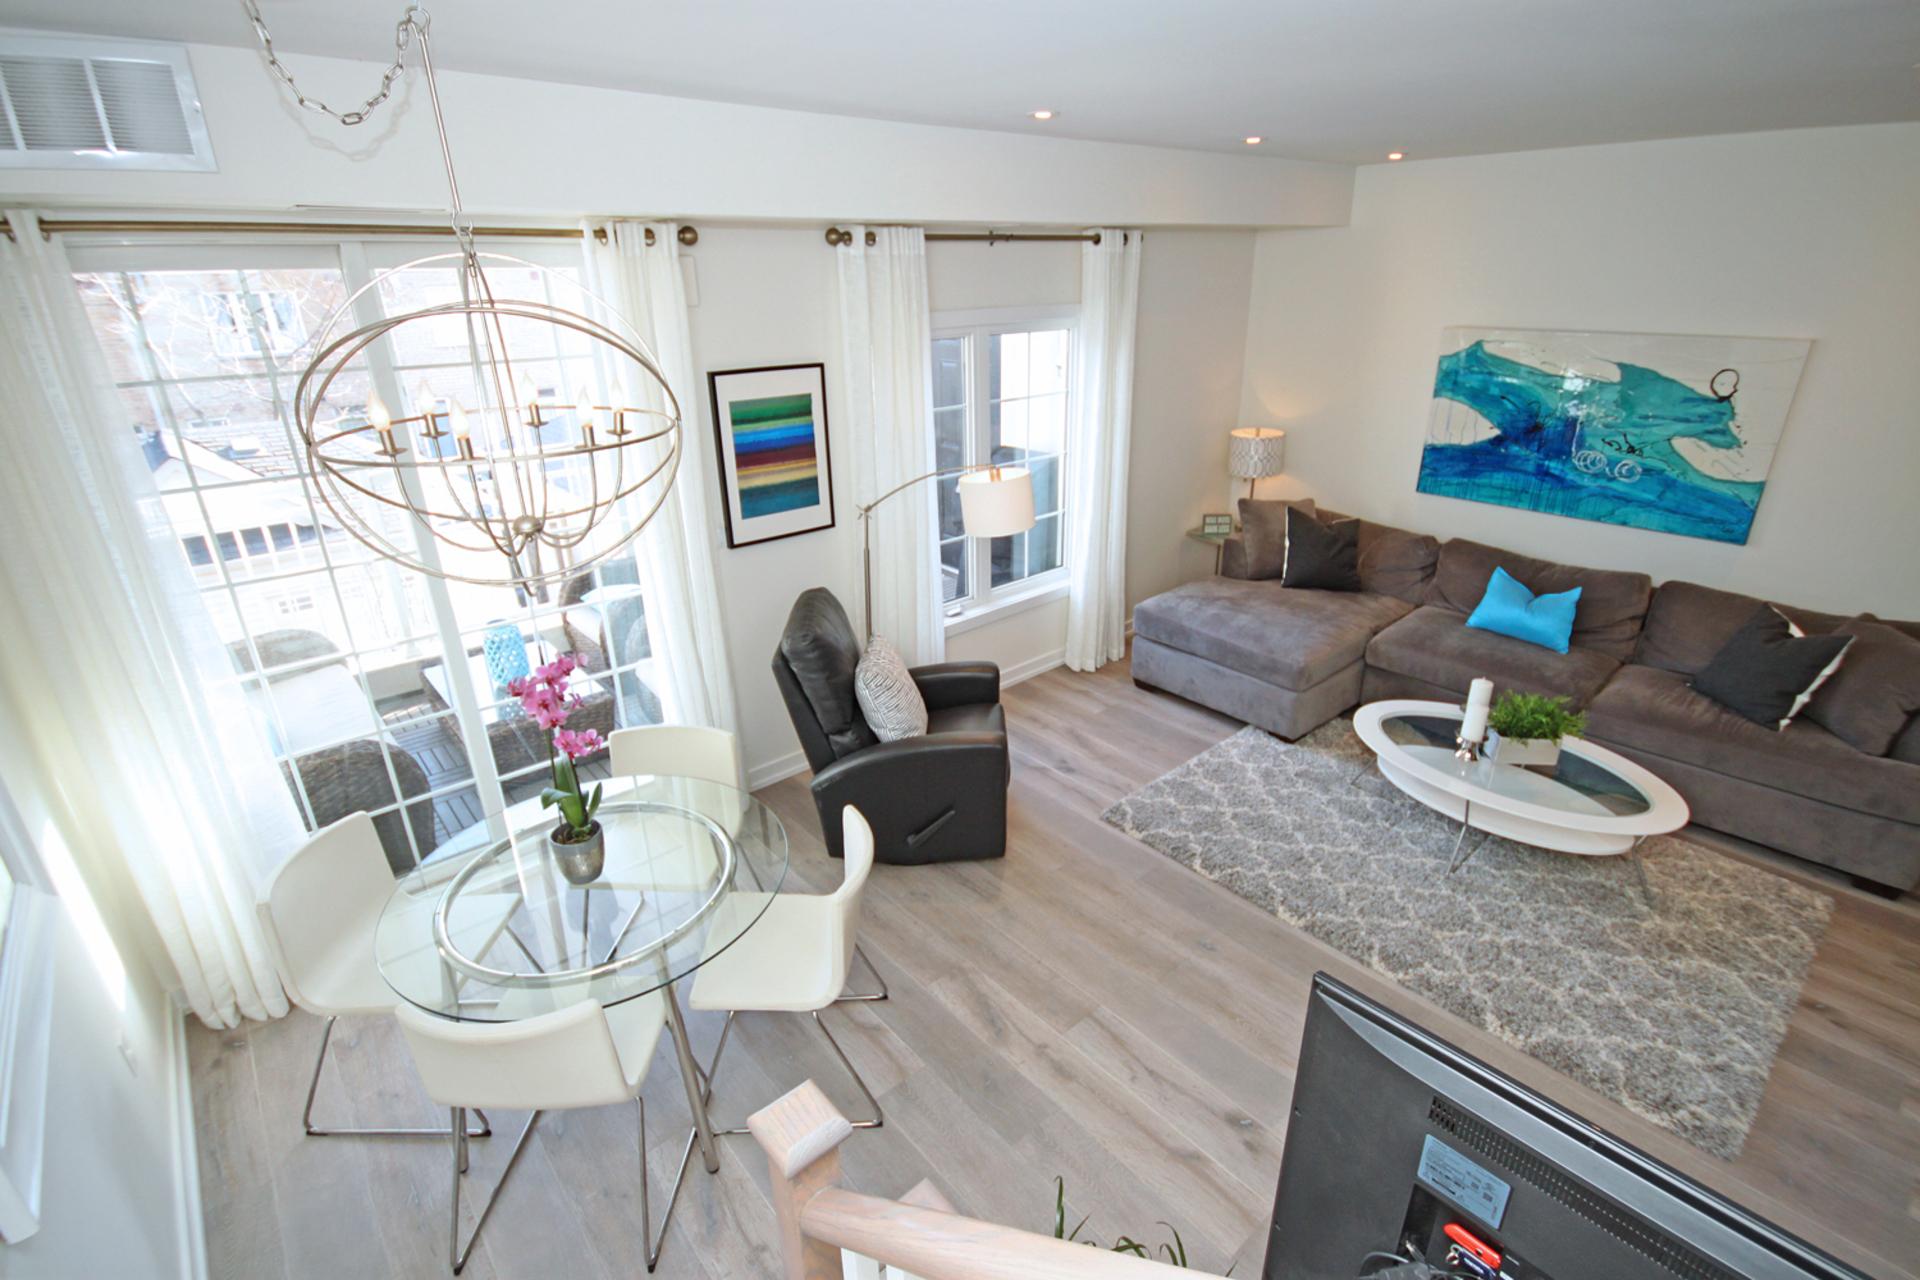 Living & Dining Room at 114 - 2320 Gerrard Street E, East End-Danforth, Toronto